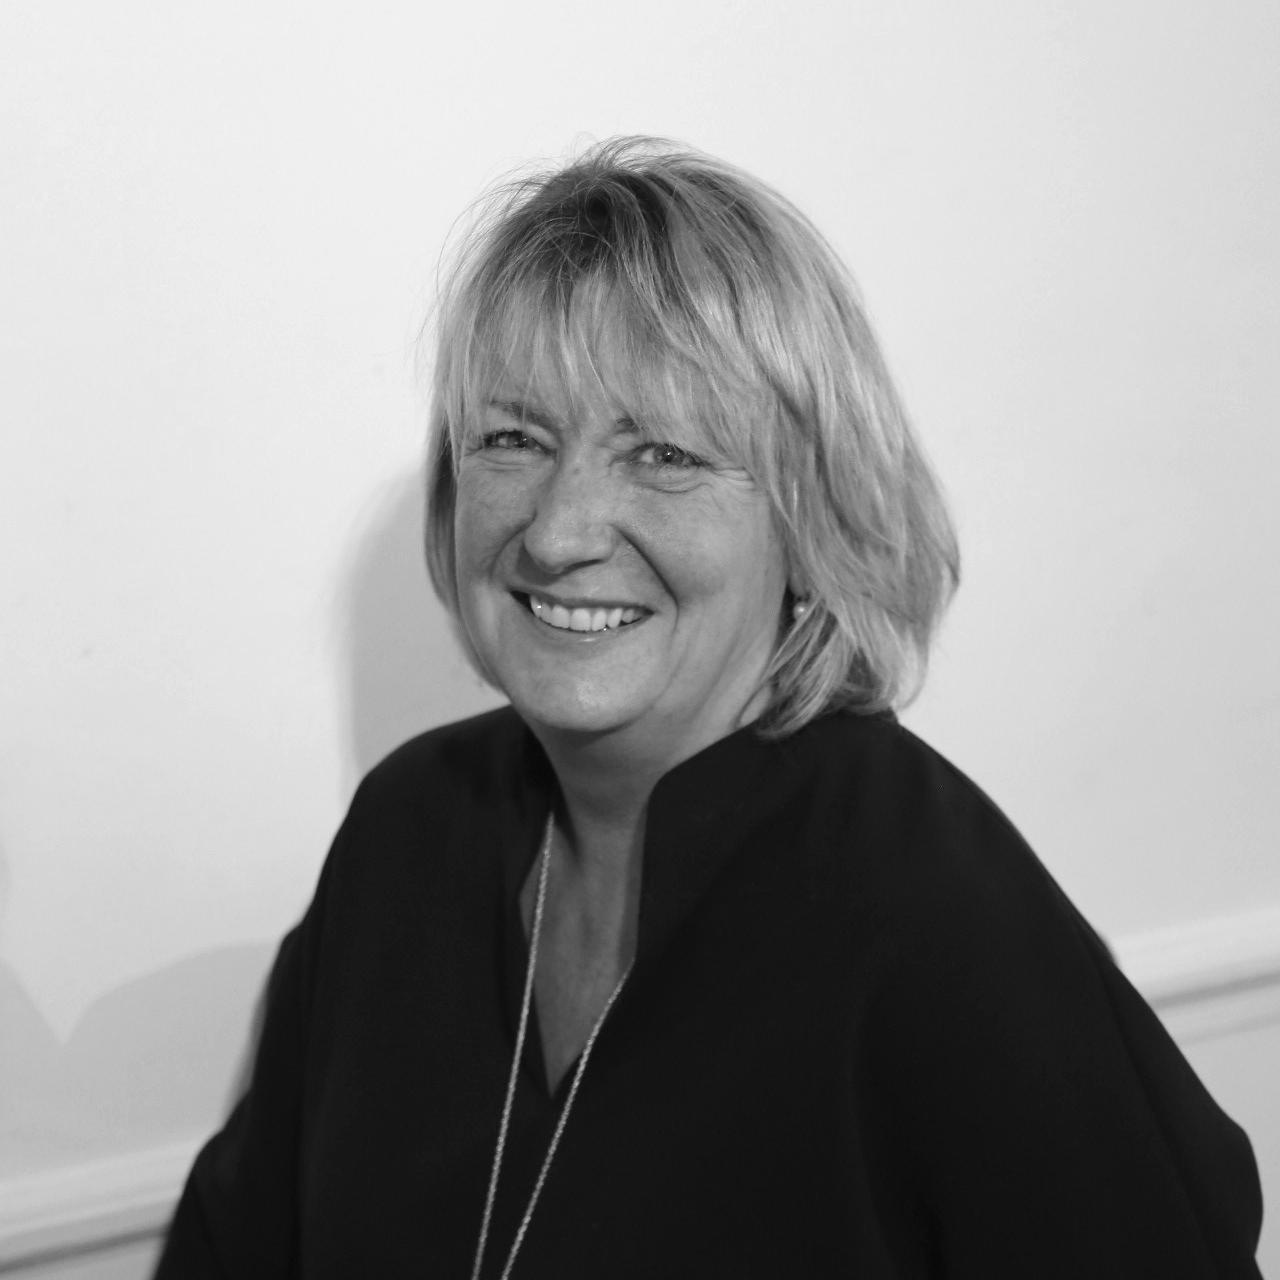 Deborah Christian